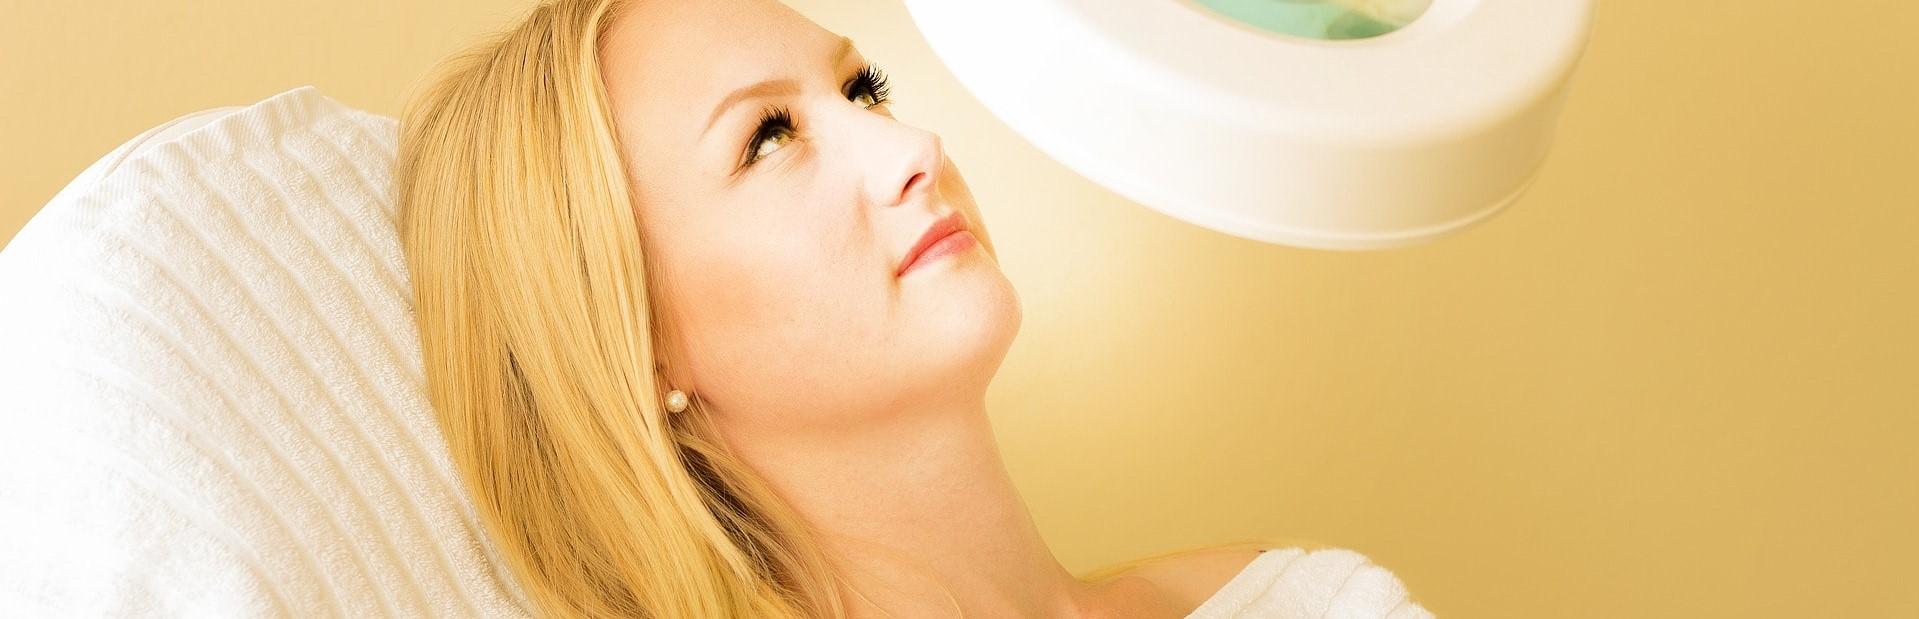 Dermatologist - West-Vlaanderen